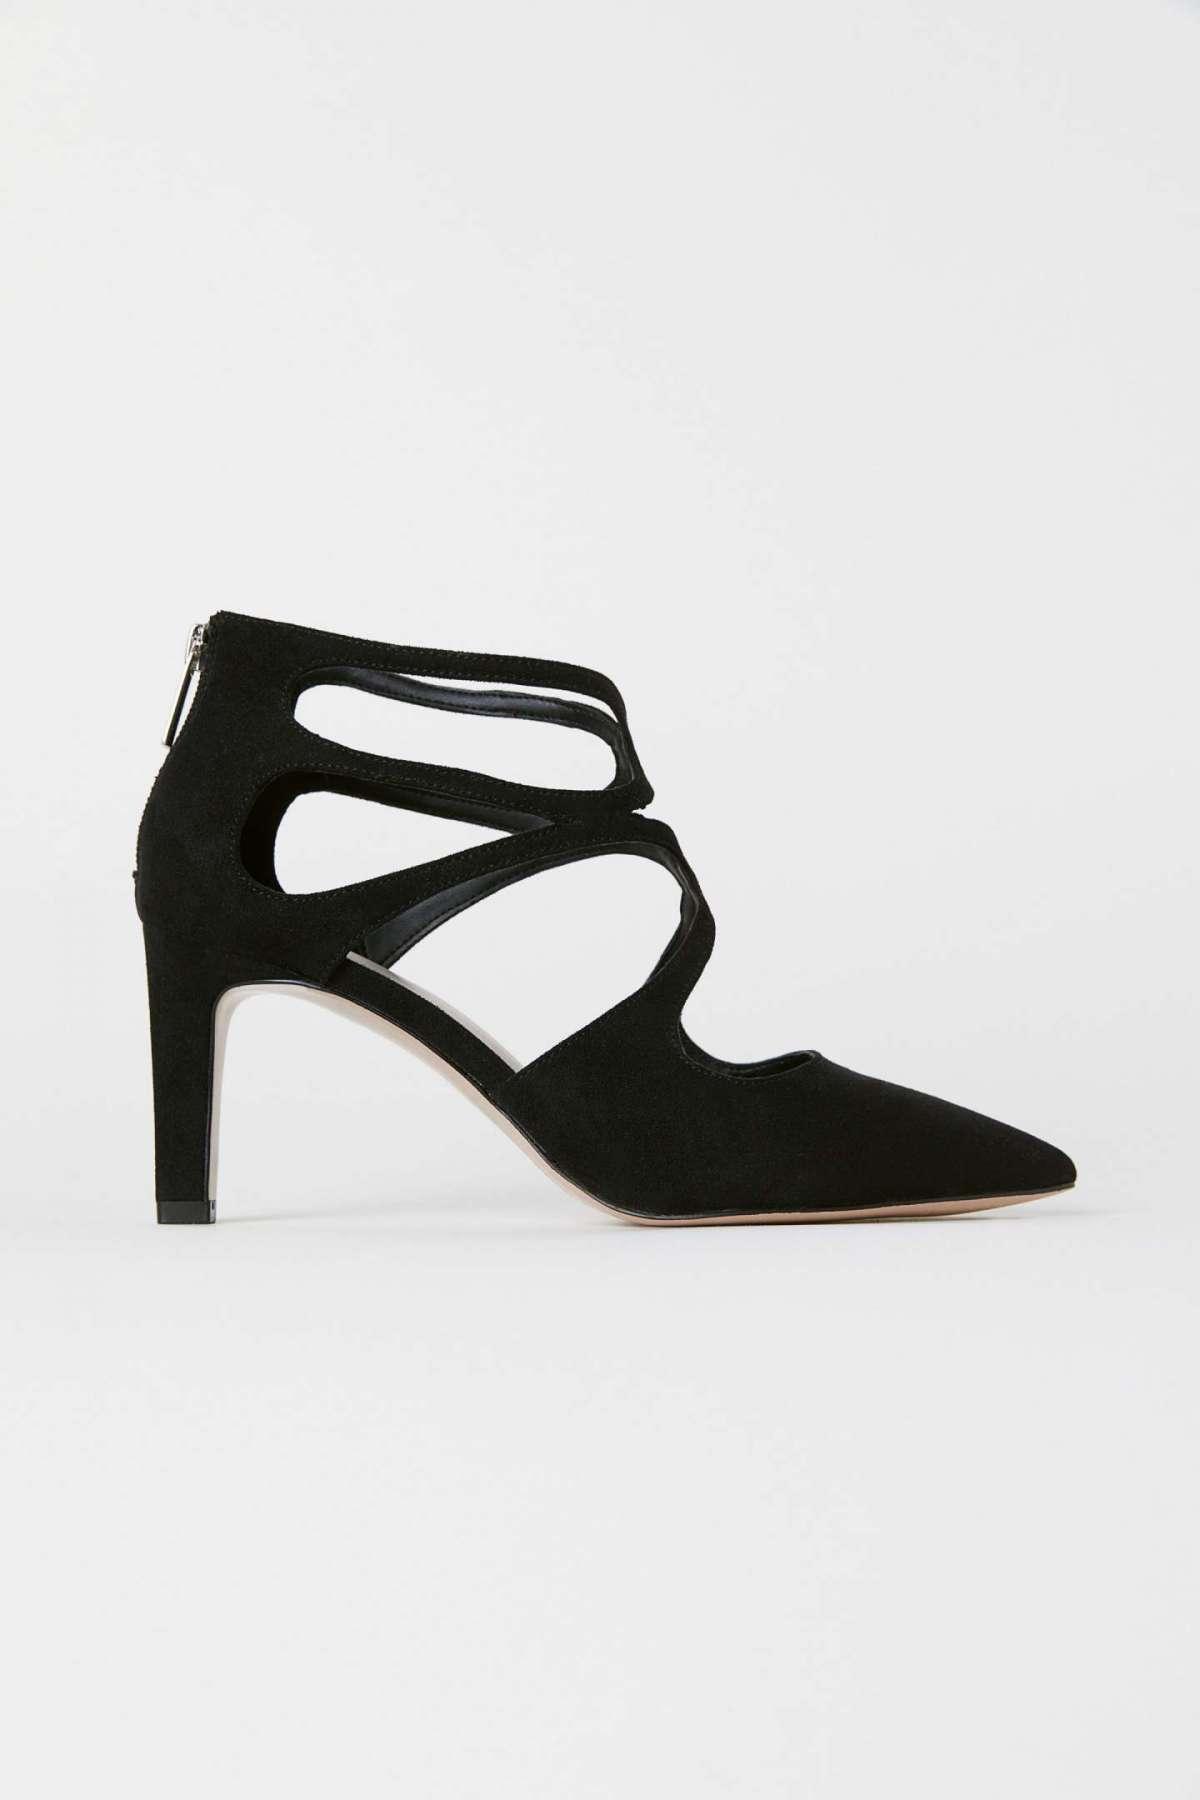 Scarpe a punta con tacco H&M a 29,99 euro